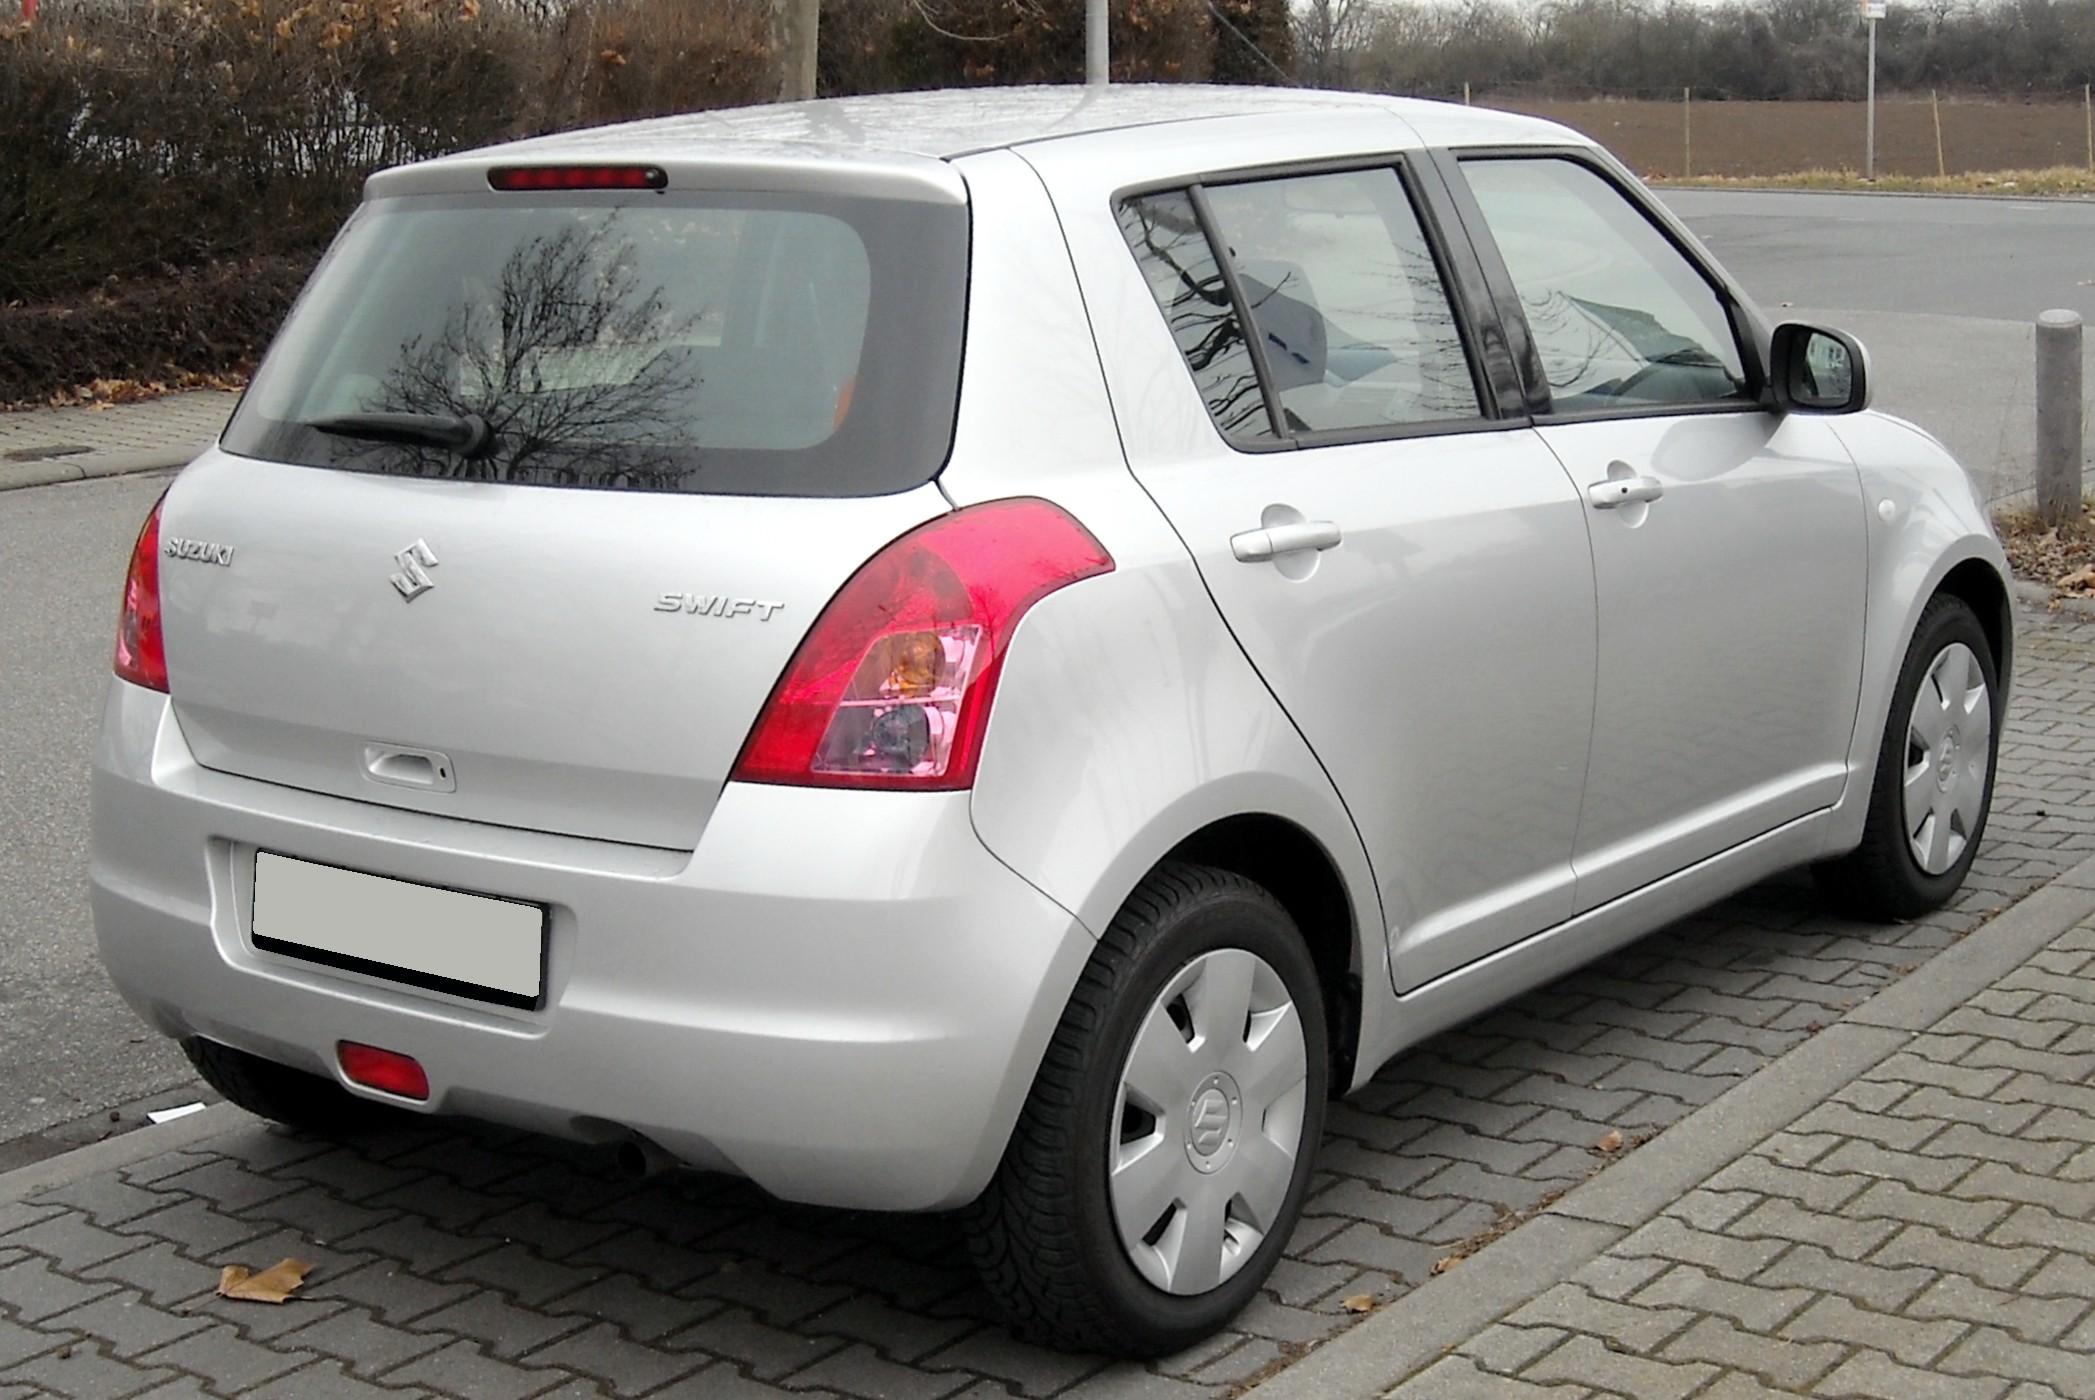 File:Suzuki Swift Rear 20090227.jpg